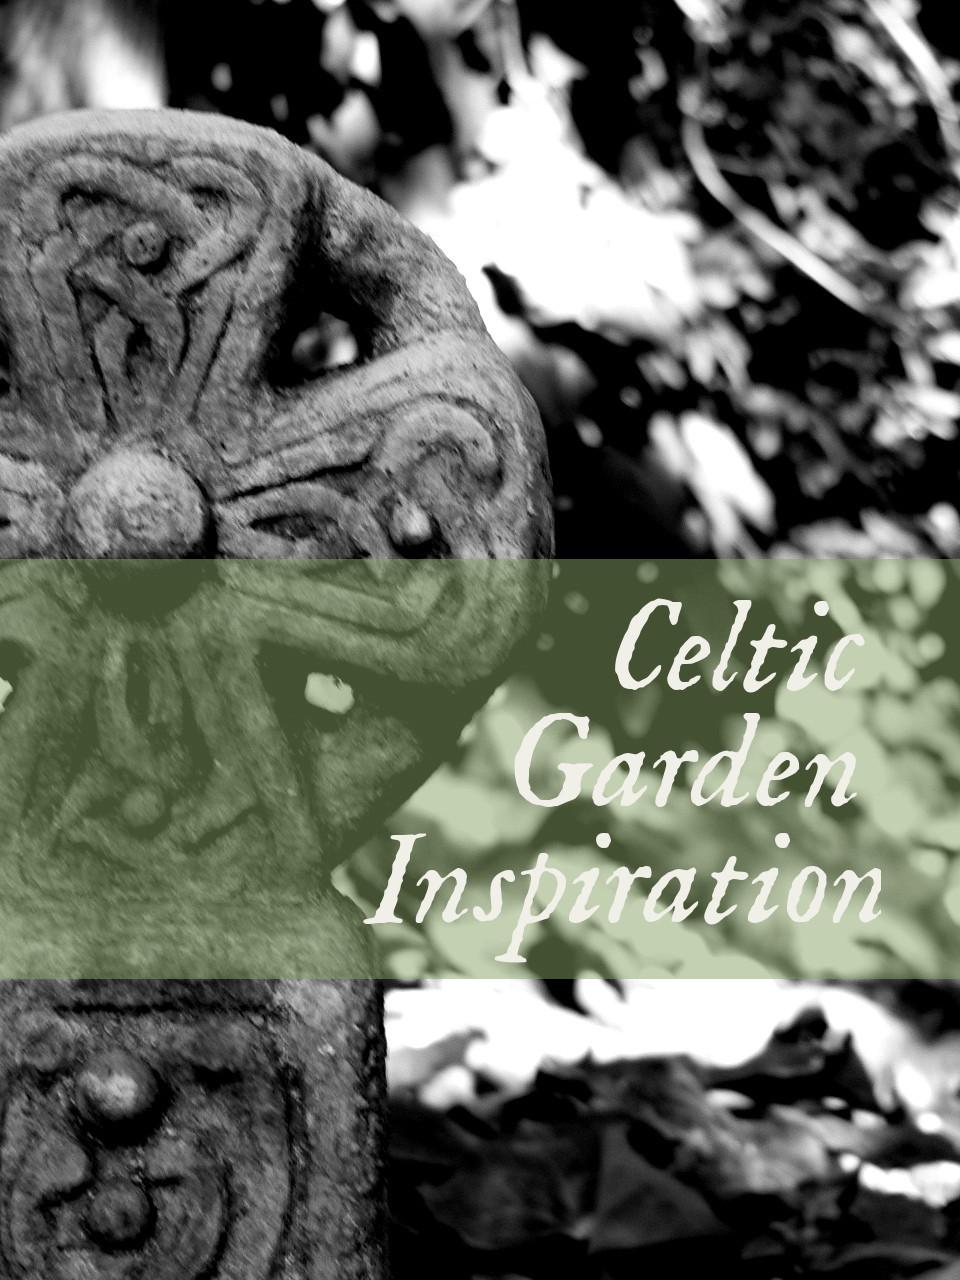 St Patrick's Day Celtic Garden Inspiration